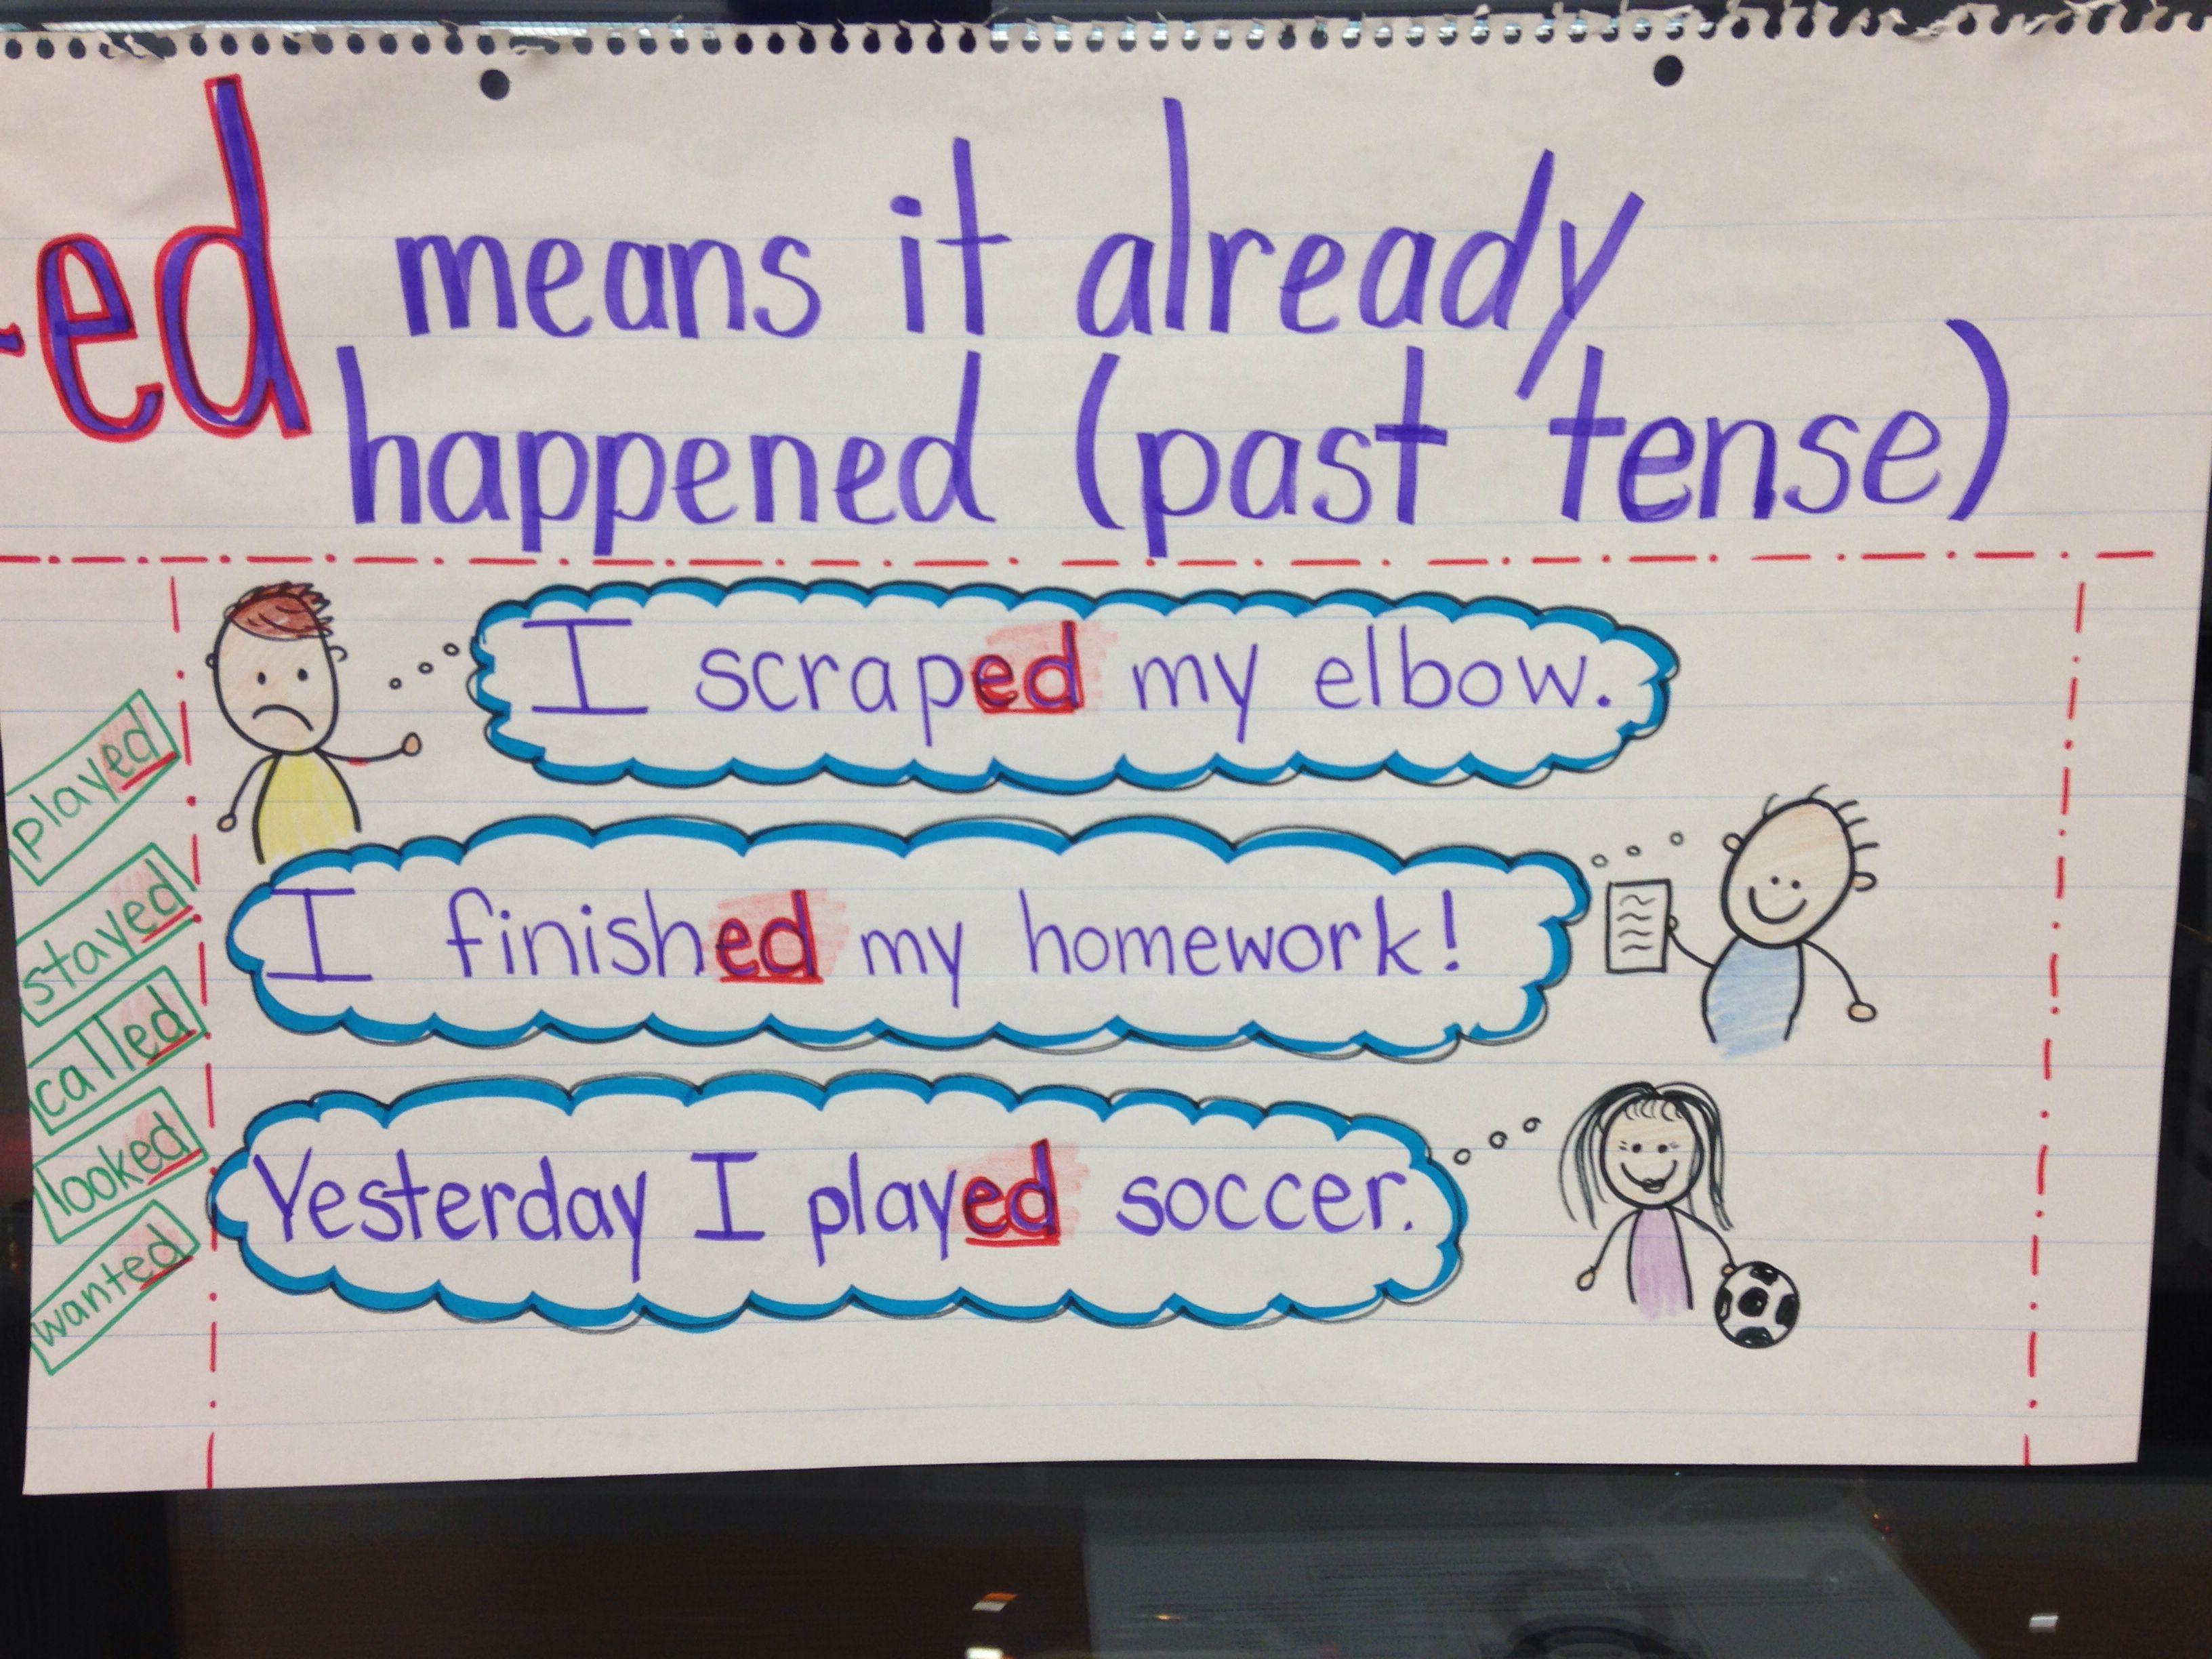 Inflected Endings Worksheet For 2nd Grade